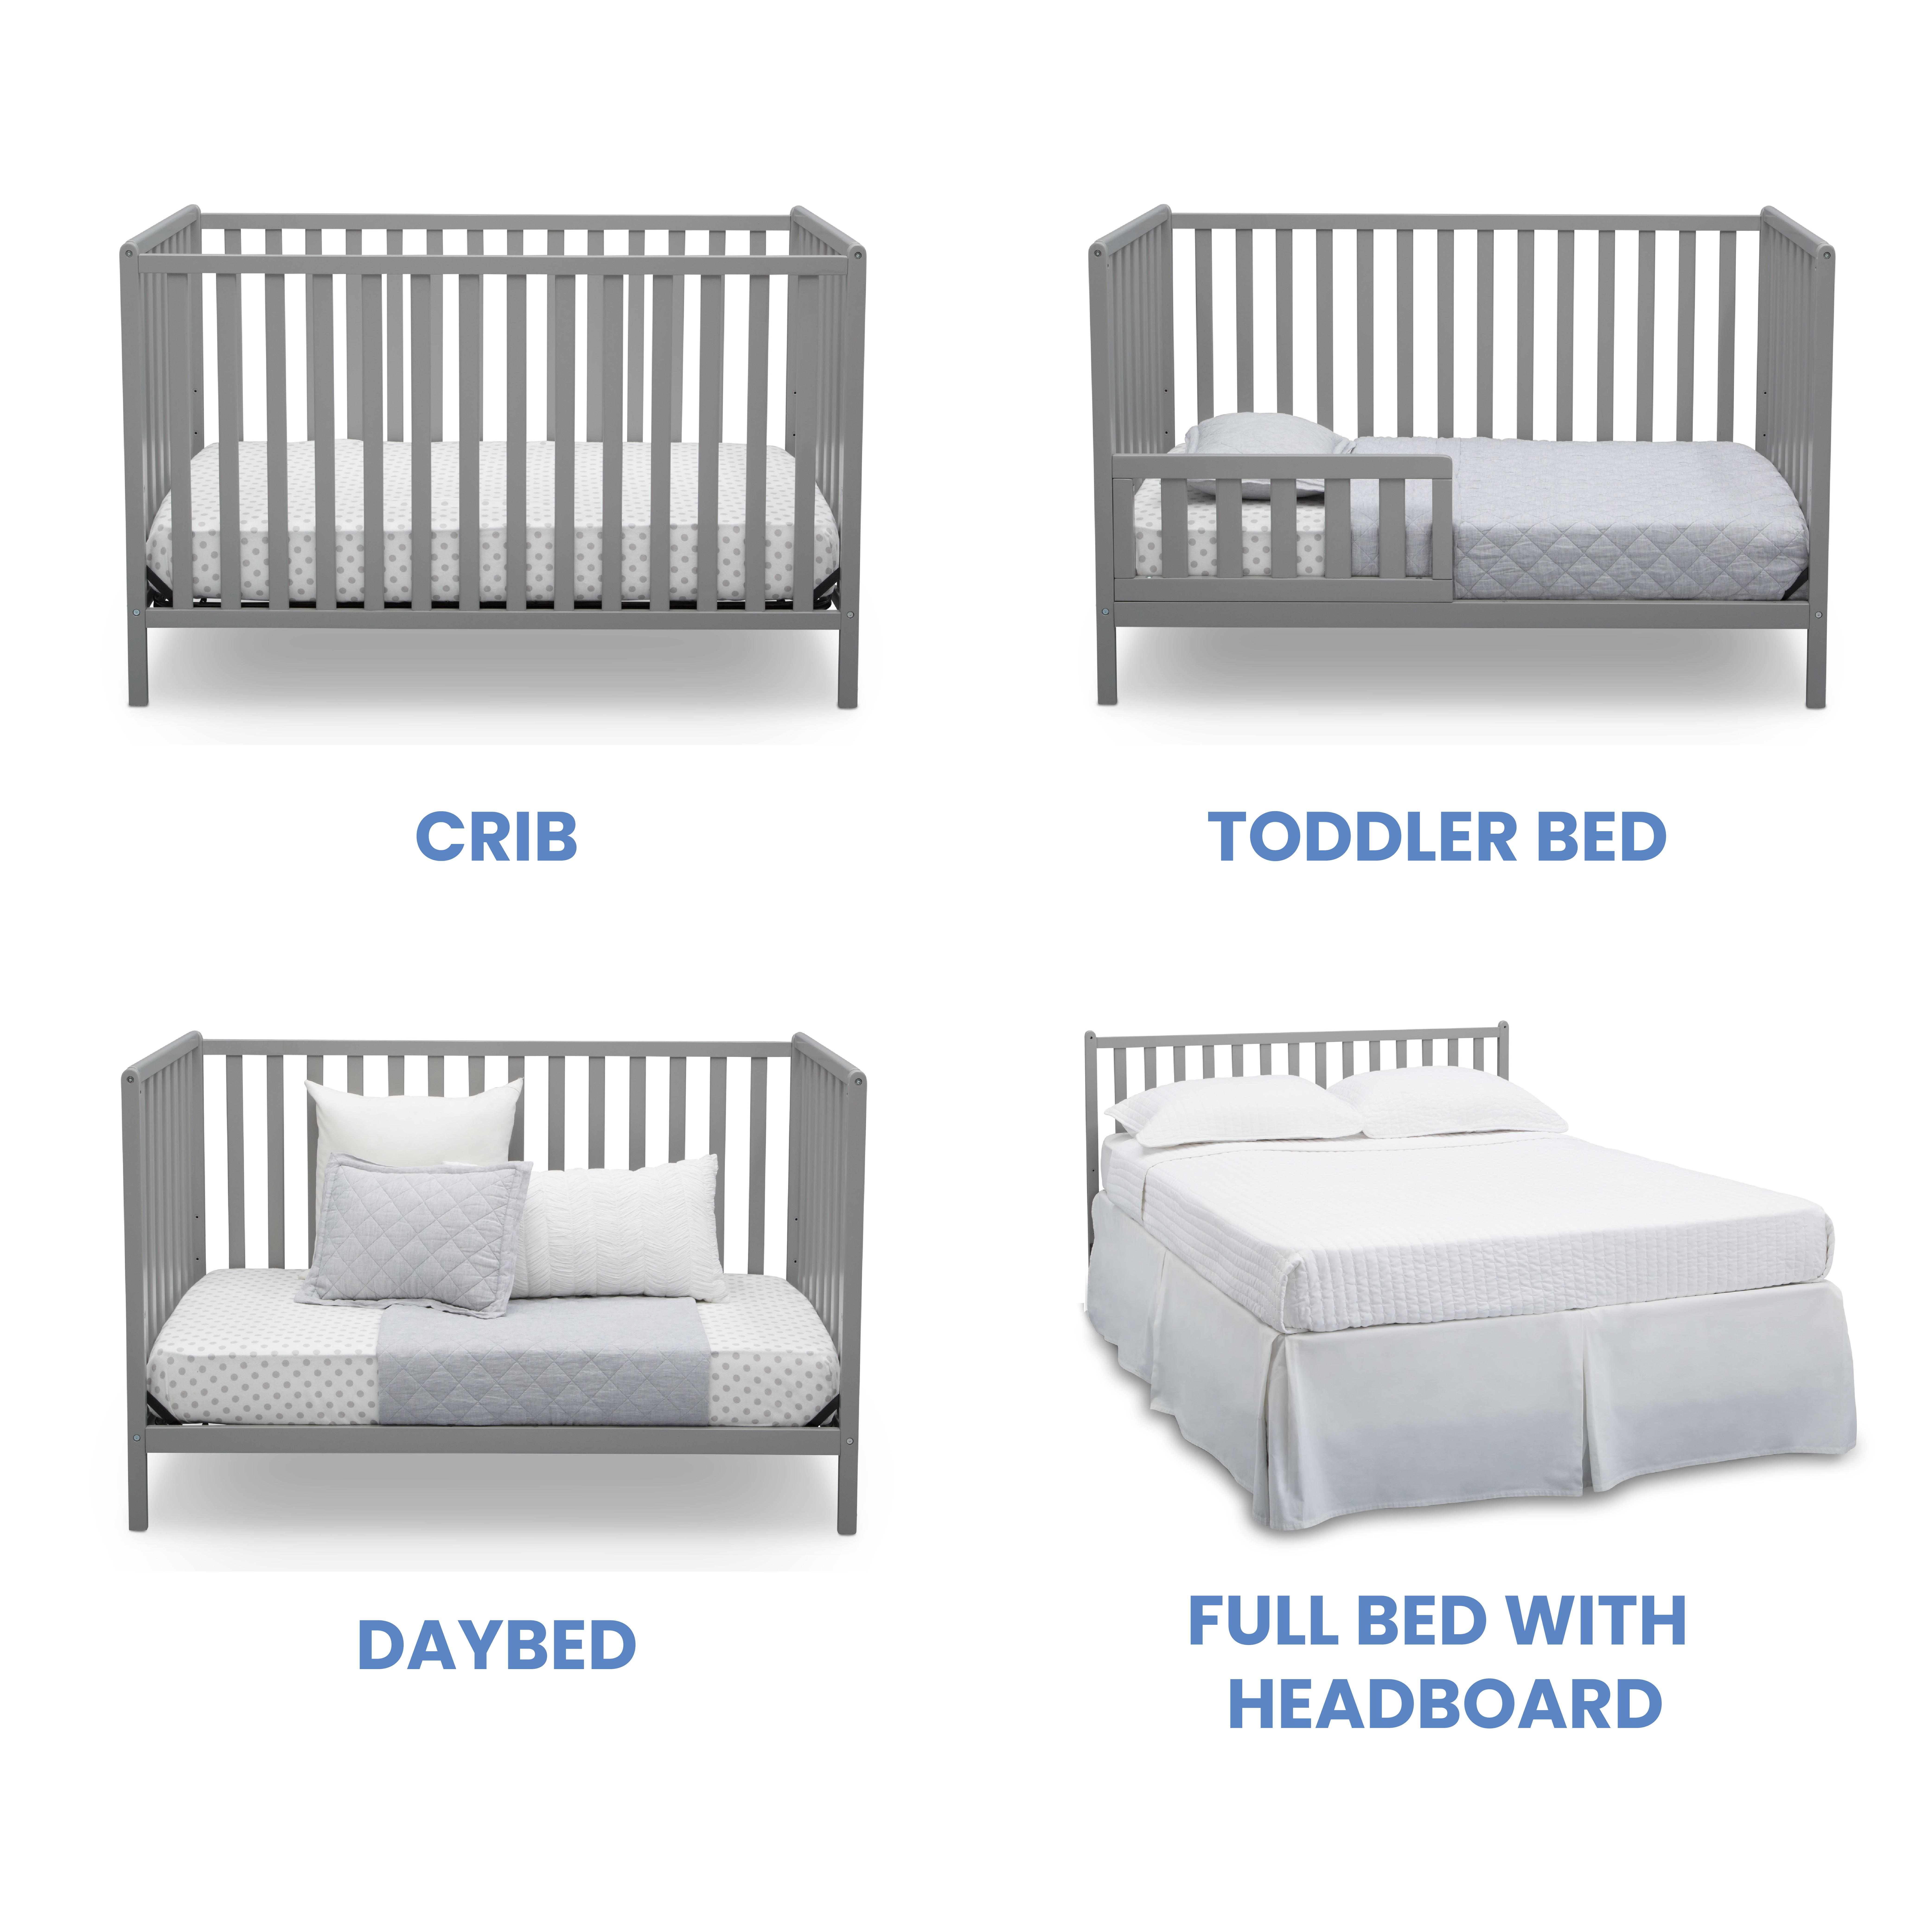 Delta Children Heartland 4 In 1 Convertible Crib Gray Walmart Com Walmart Com